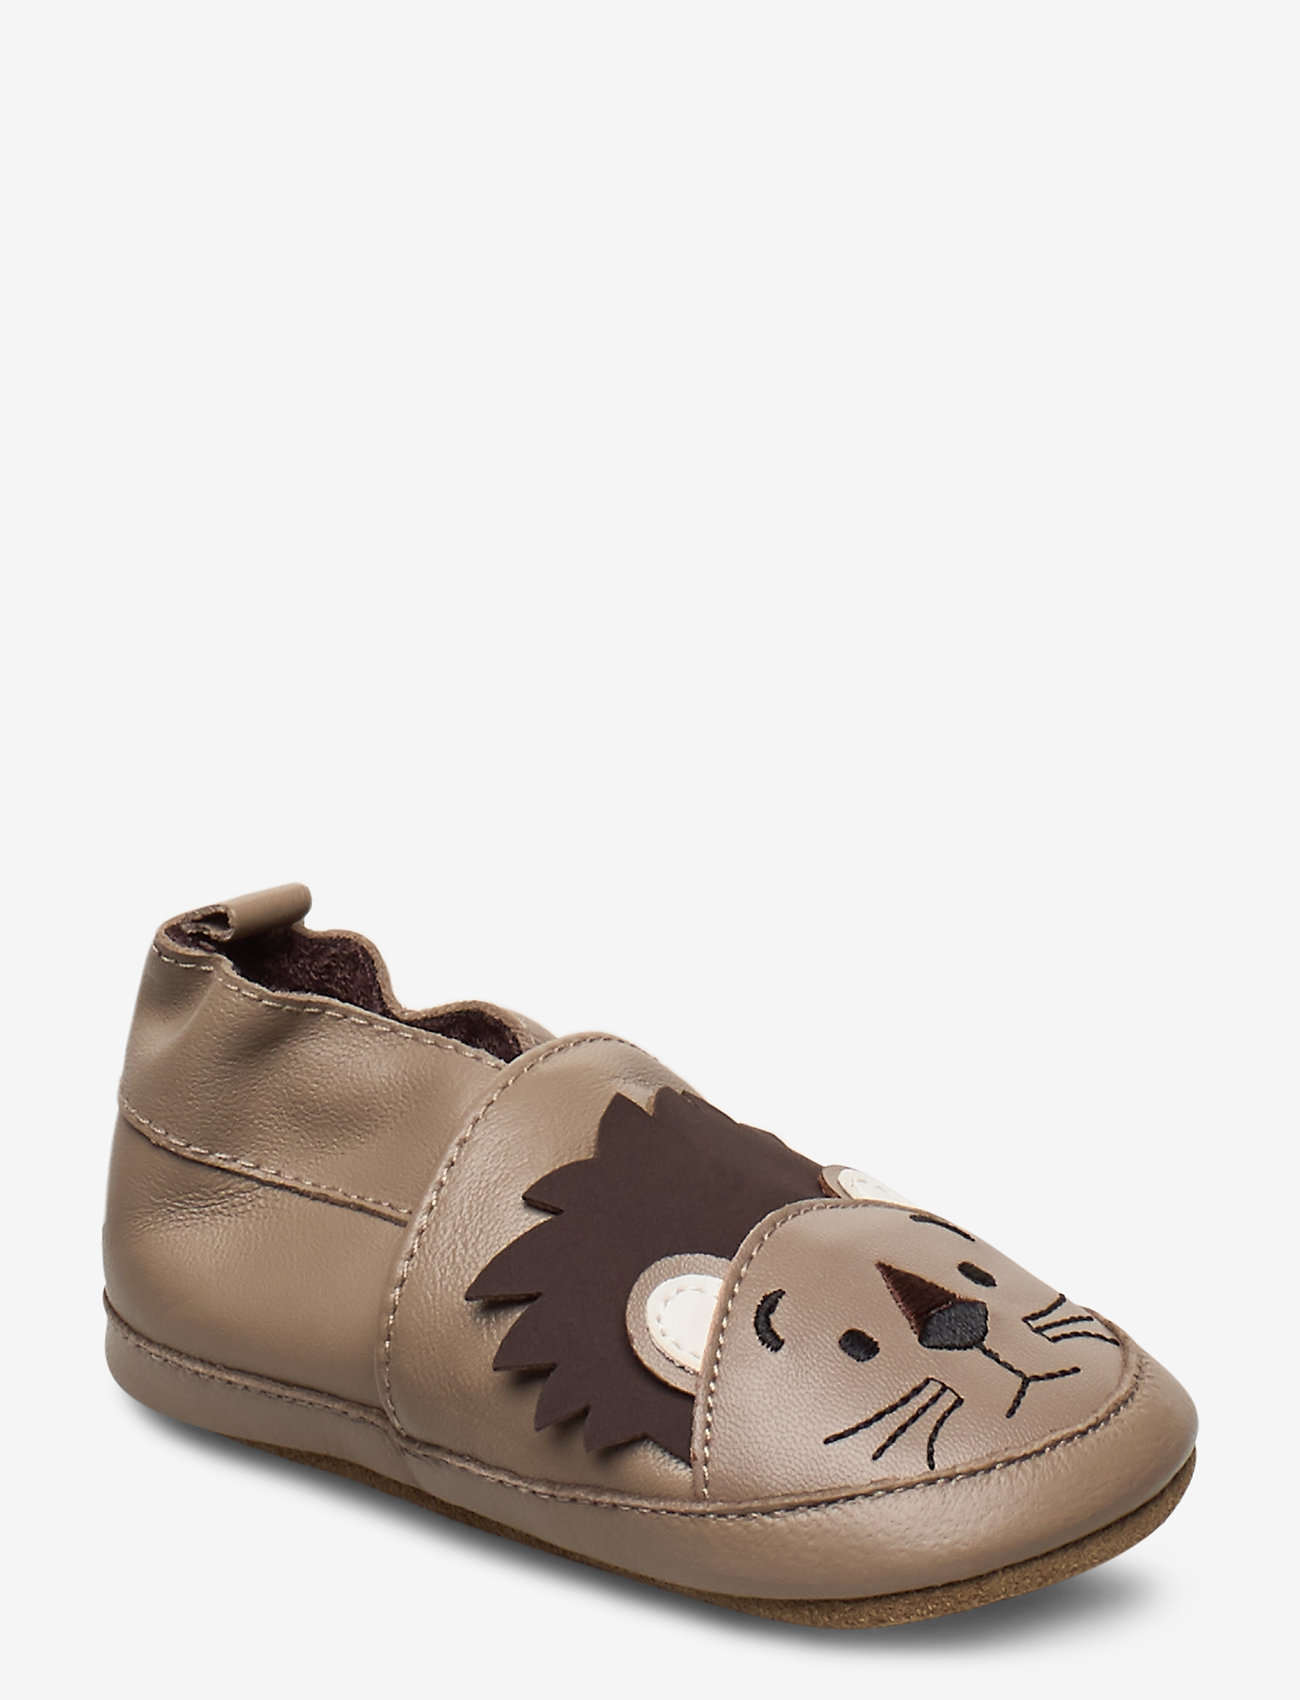 Melton - Leather Shoe - Lion - tossut - warm taupe